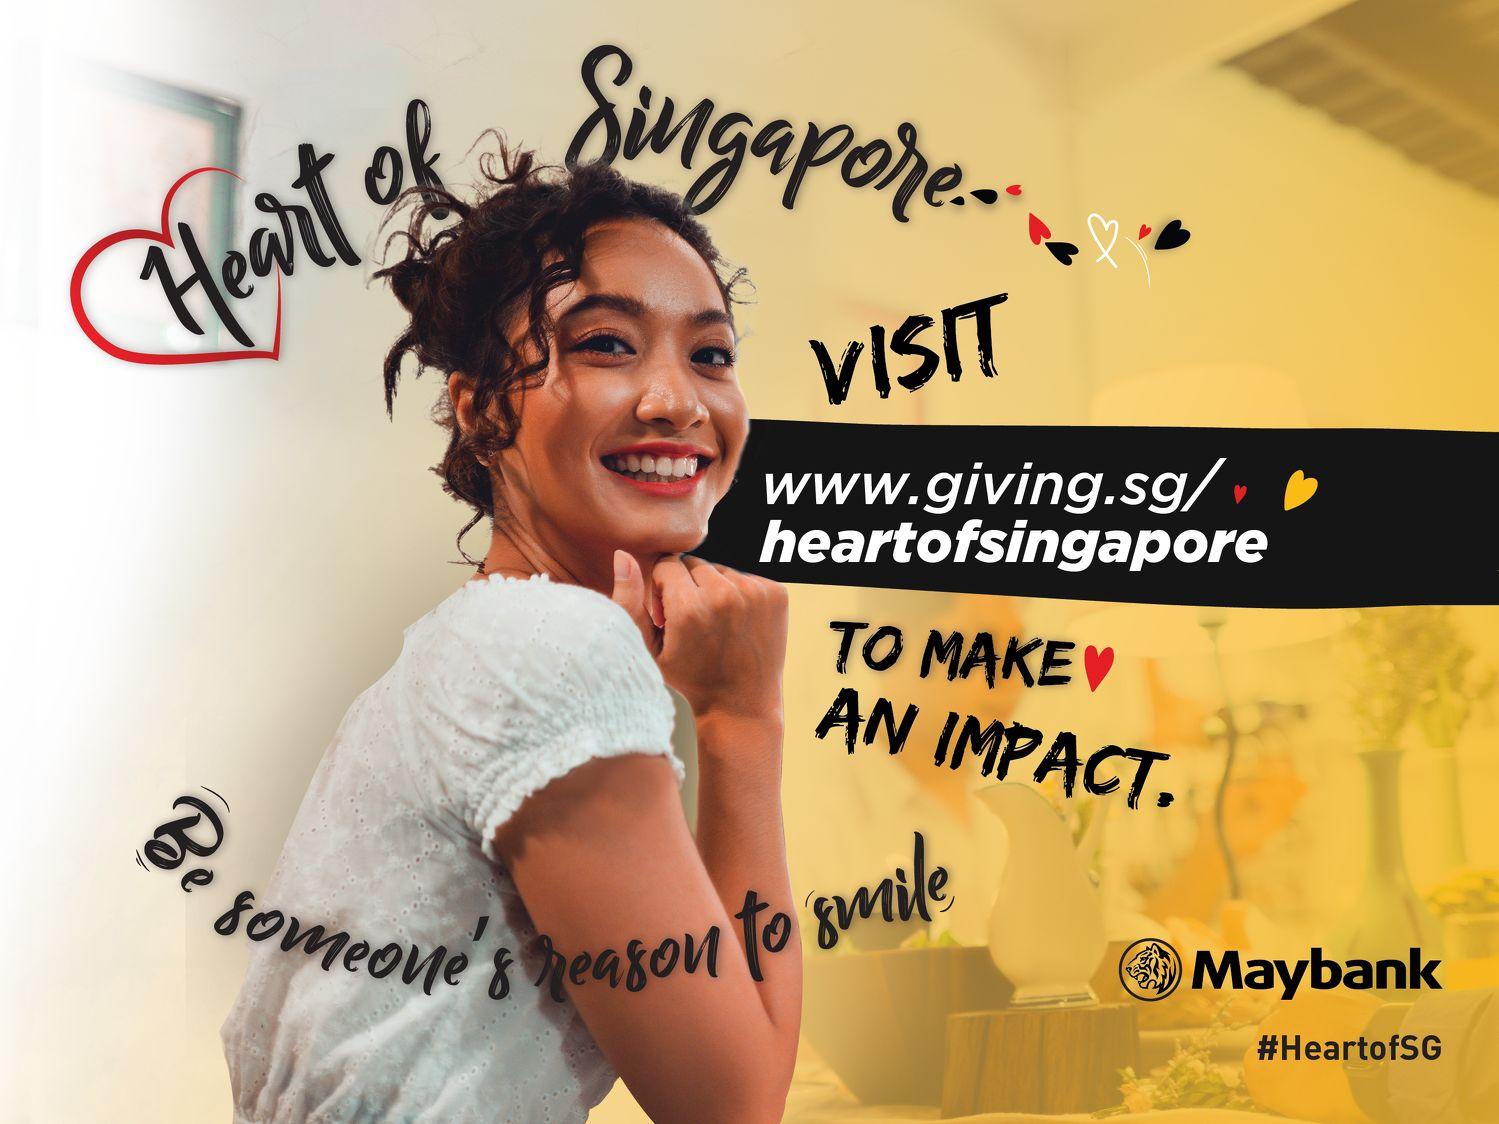 FUNDRAISER - THE EDGE SINGAPORE